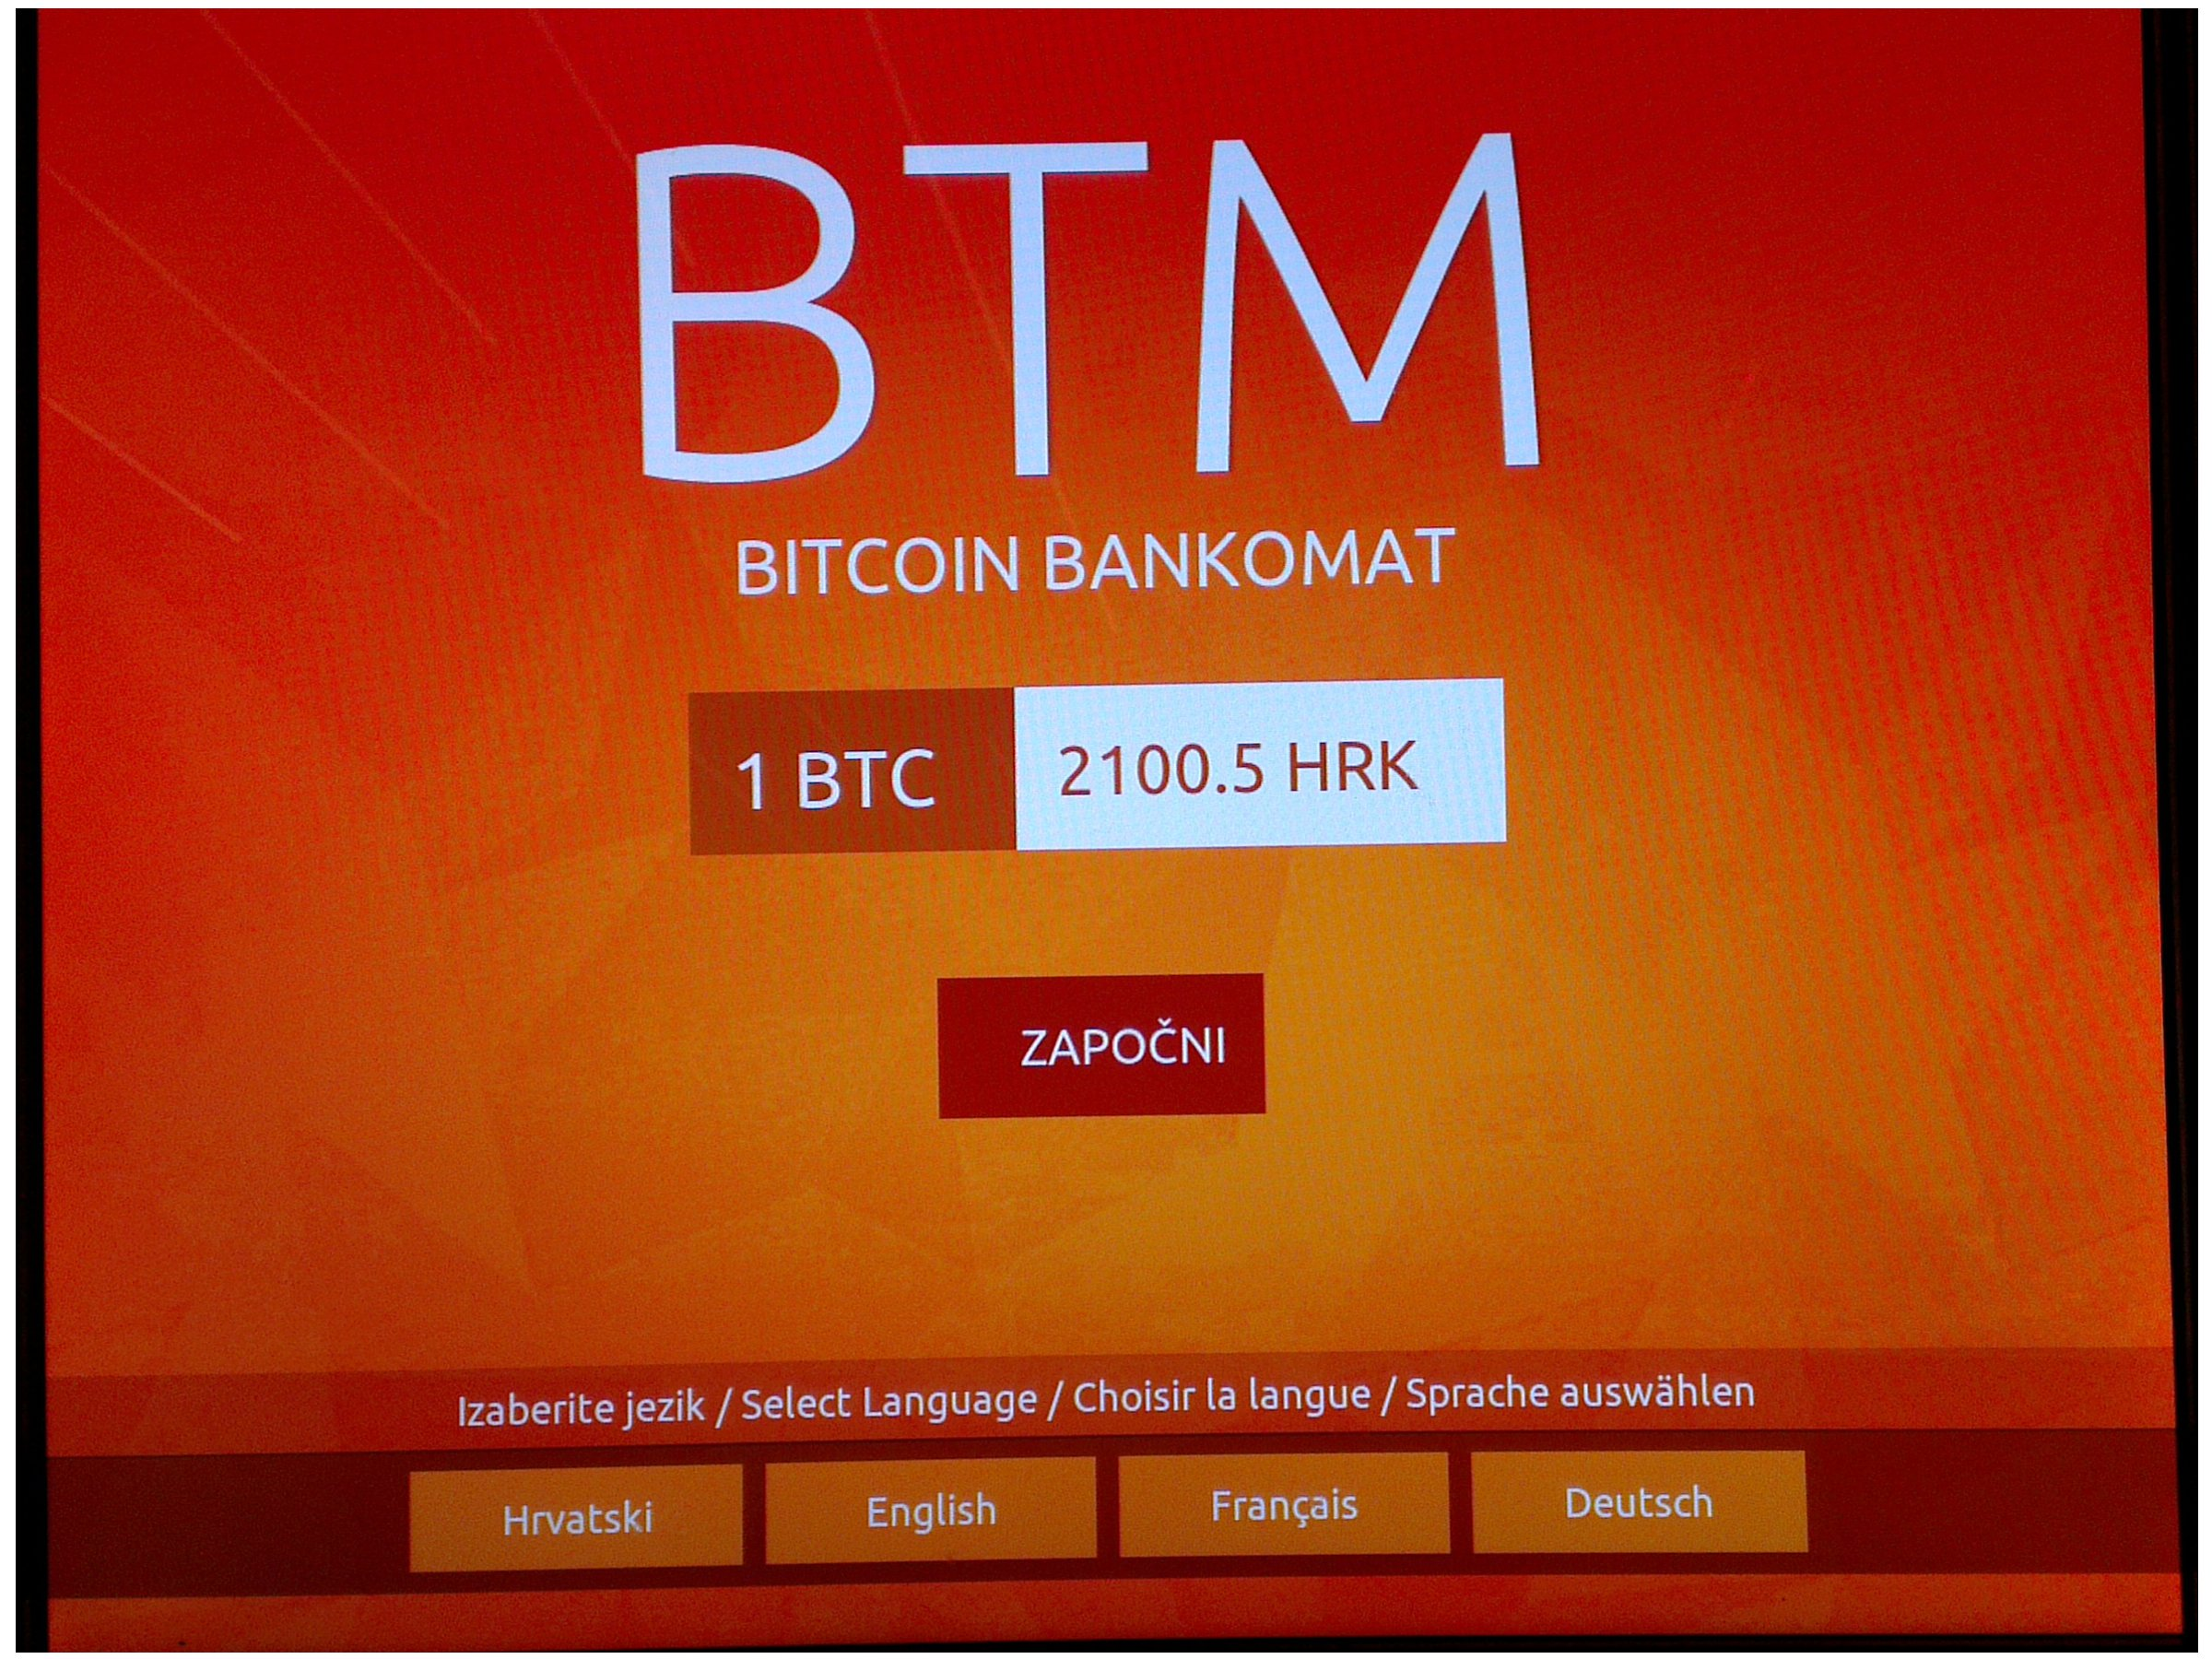 bitcoin bankomat zagrebas)